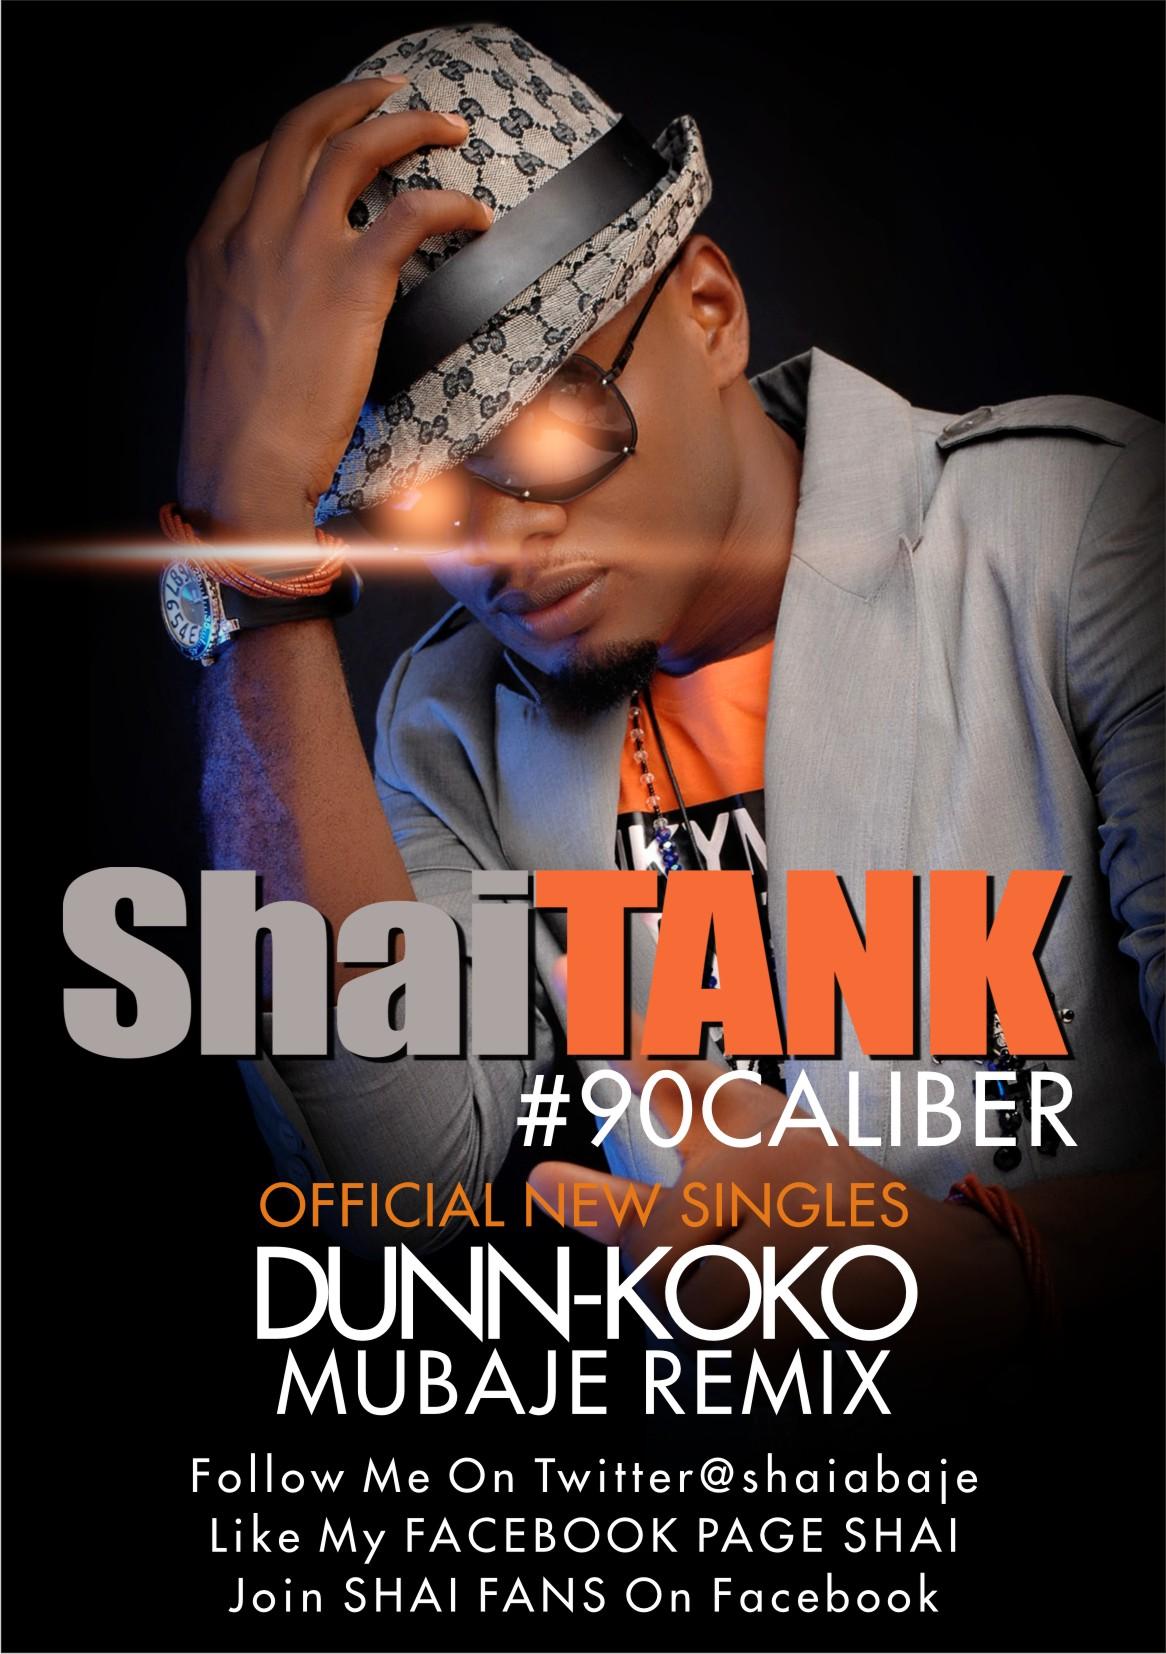 ShaiTANK - DUNN KOKO [prod. by Slim Beatz] + MUBAJE REMIX Artwork | AceWorldTeam.com